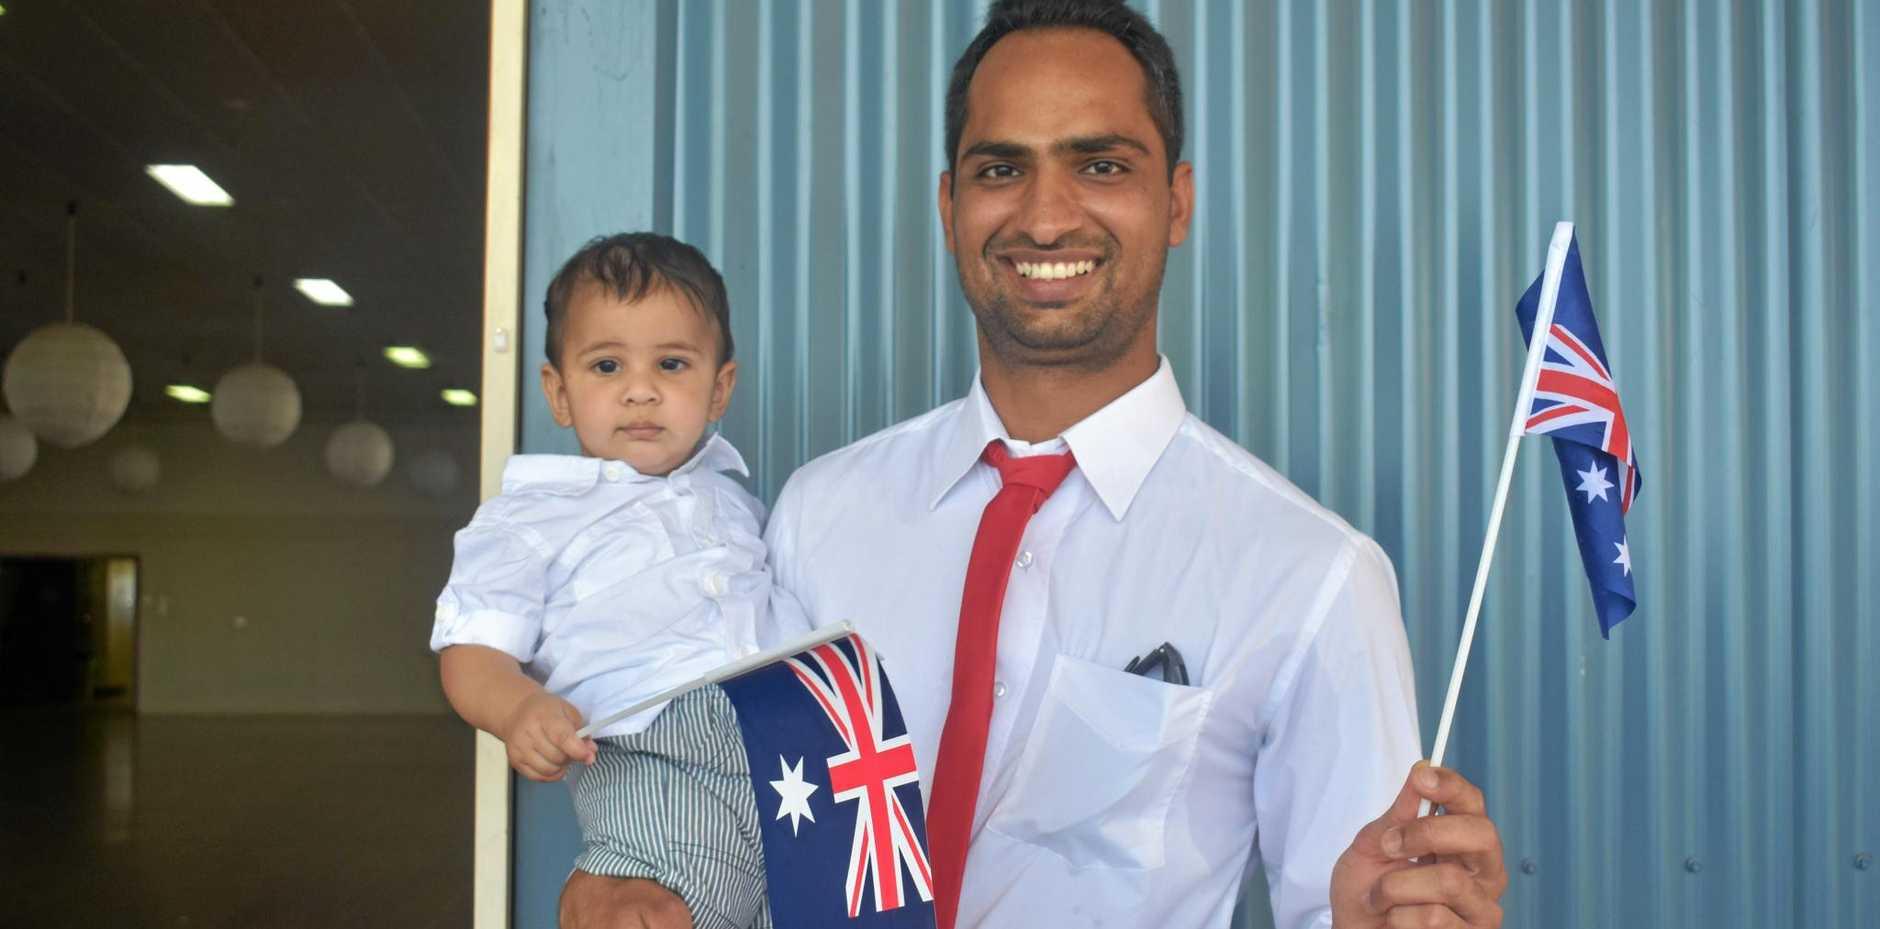 AUSTRALIA DAY: New citizen Harry Dhillon with his son, Arjun, at Australia Day celebrations in Dalby.